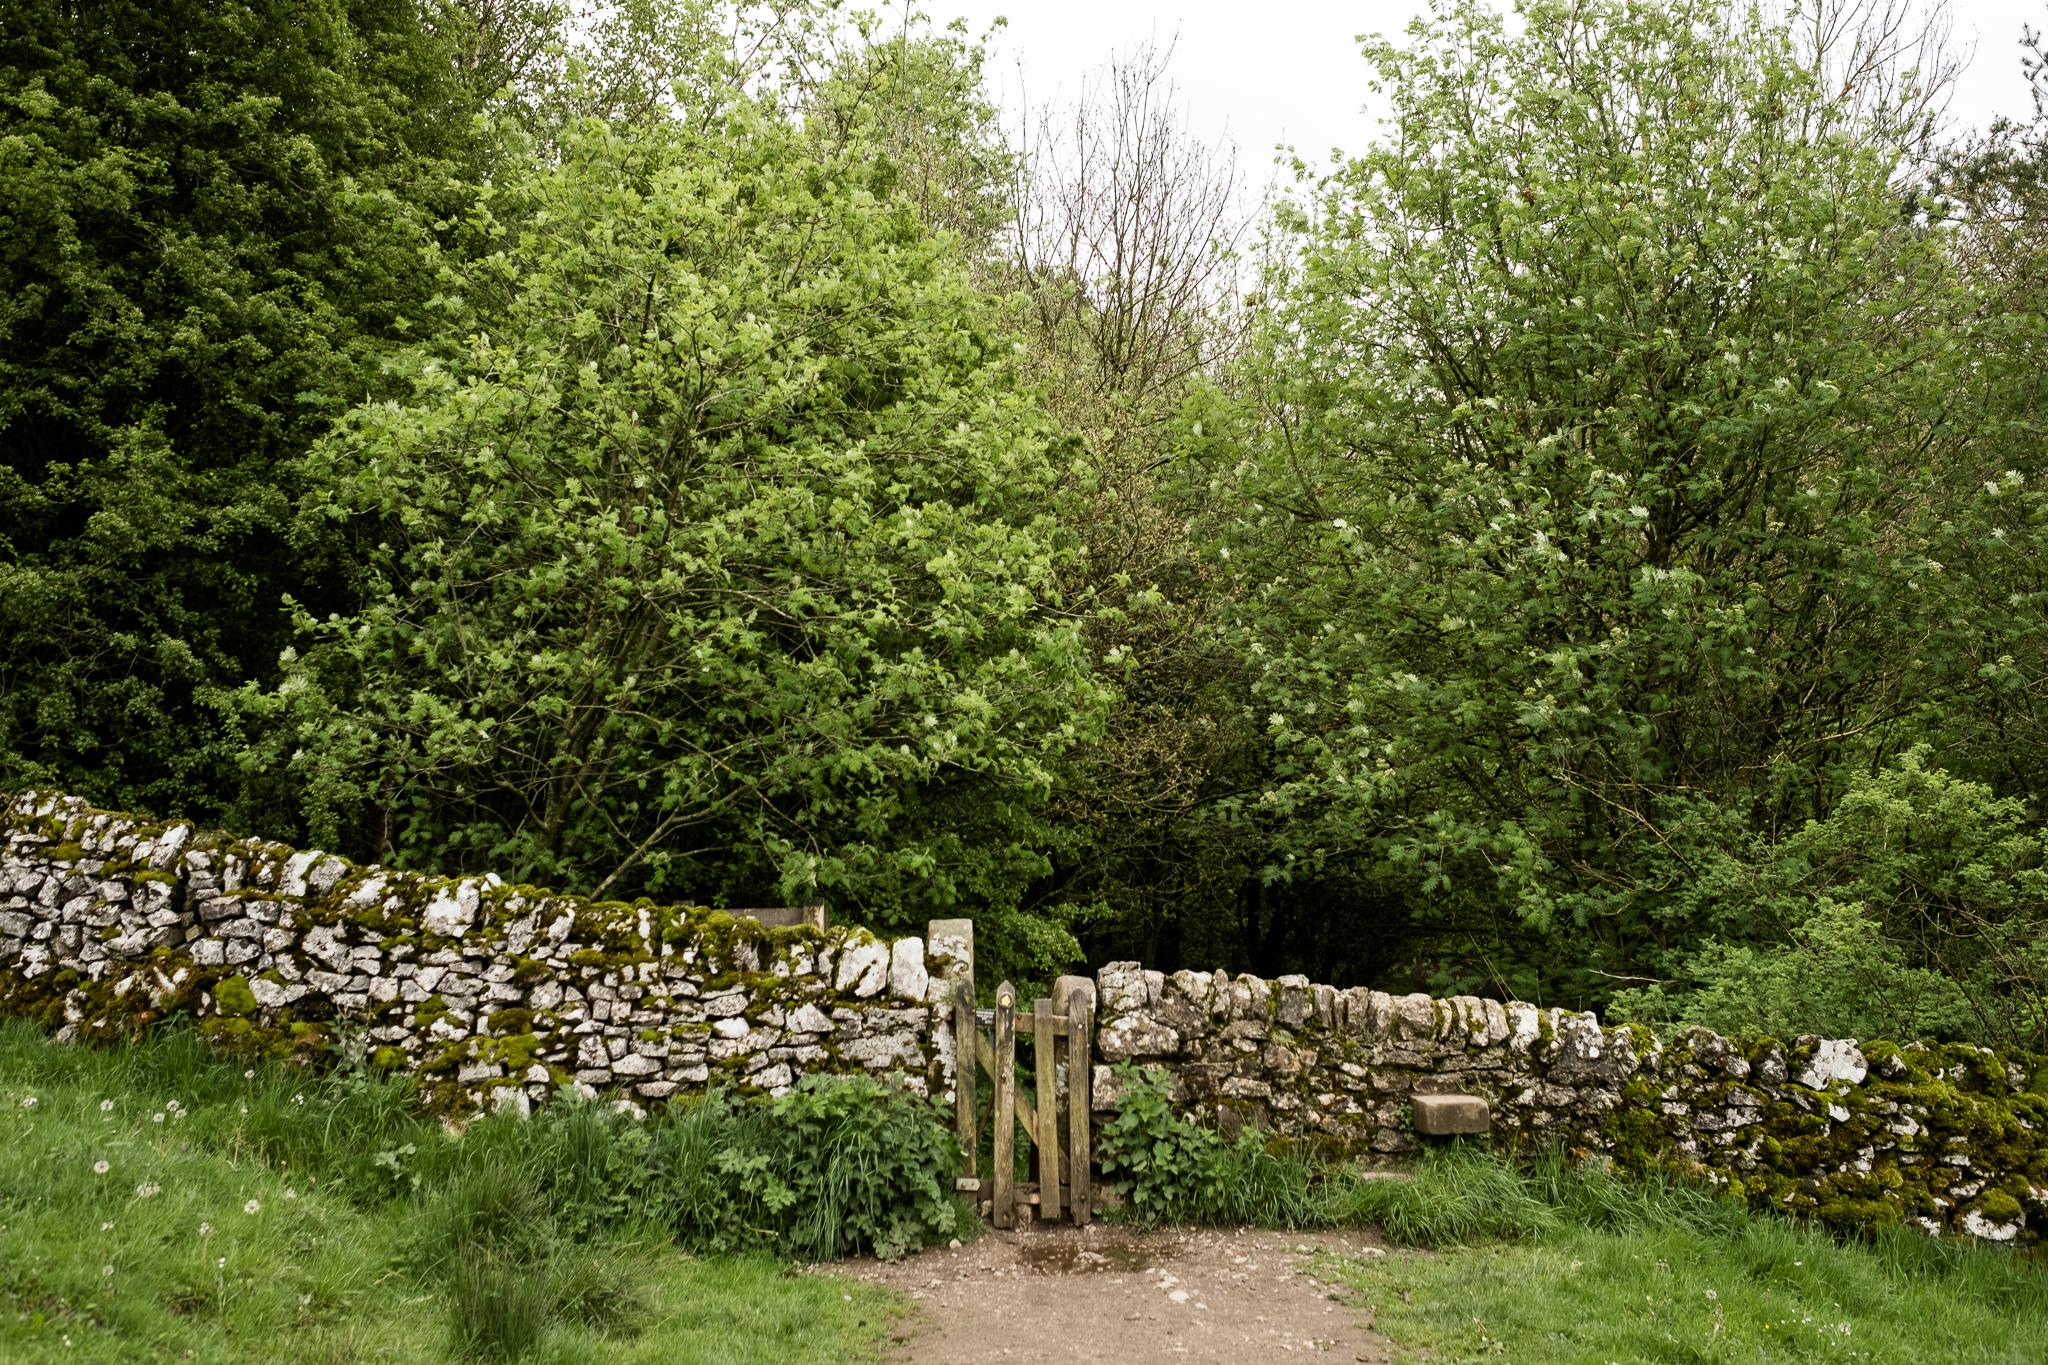 05.19.2017 The Photowalk Network Get Some Fresh Air Photowalk at Hartington and Biggin, Staffordshire Peak District National Trust-5.jpg